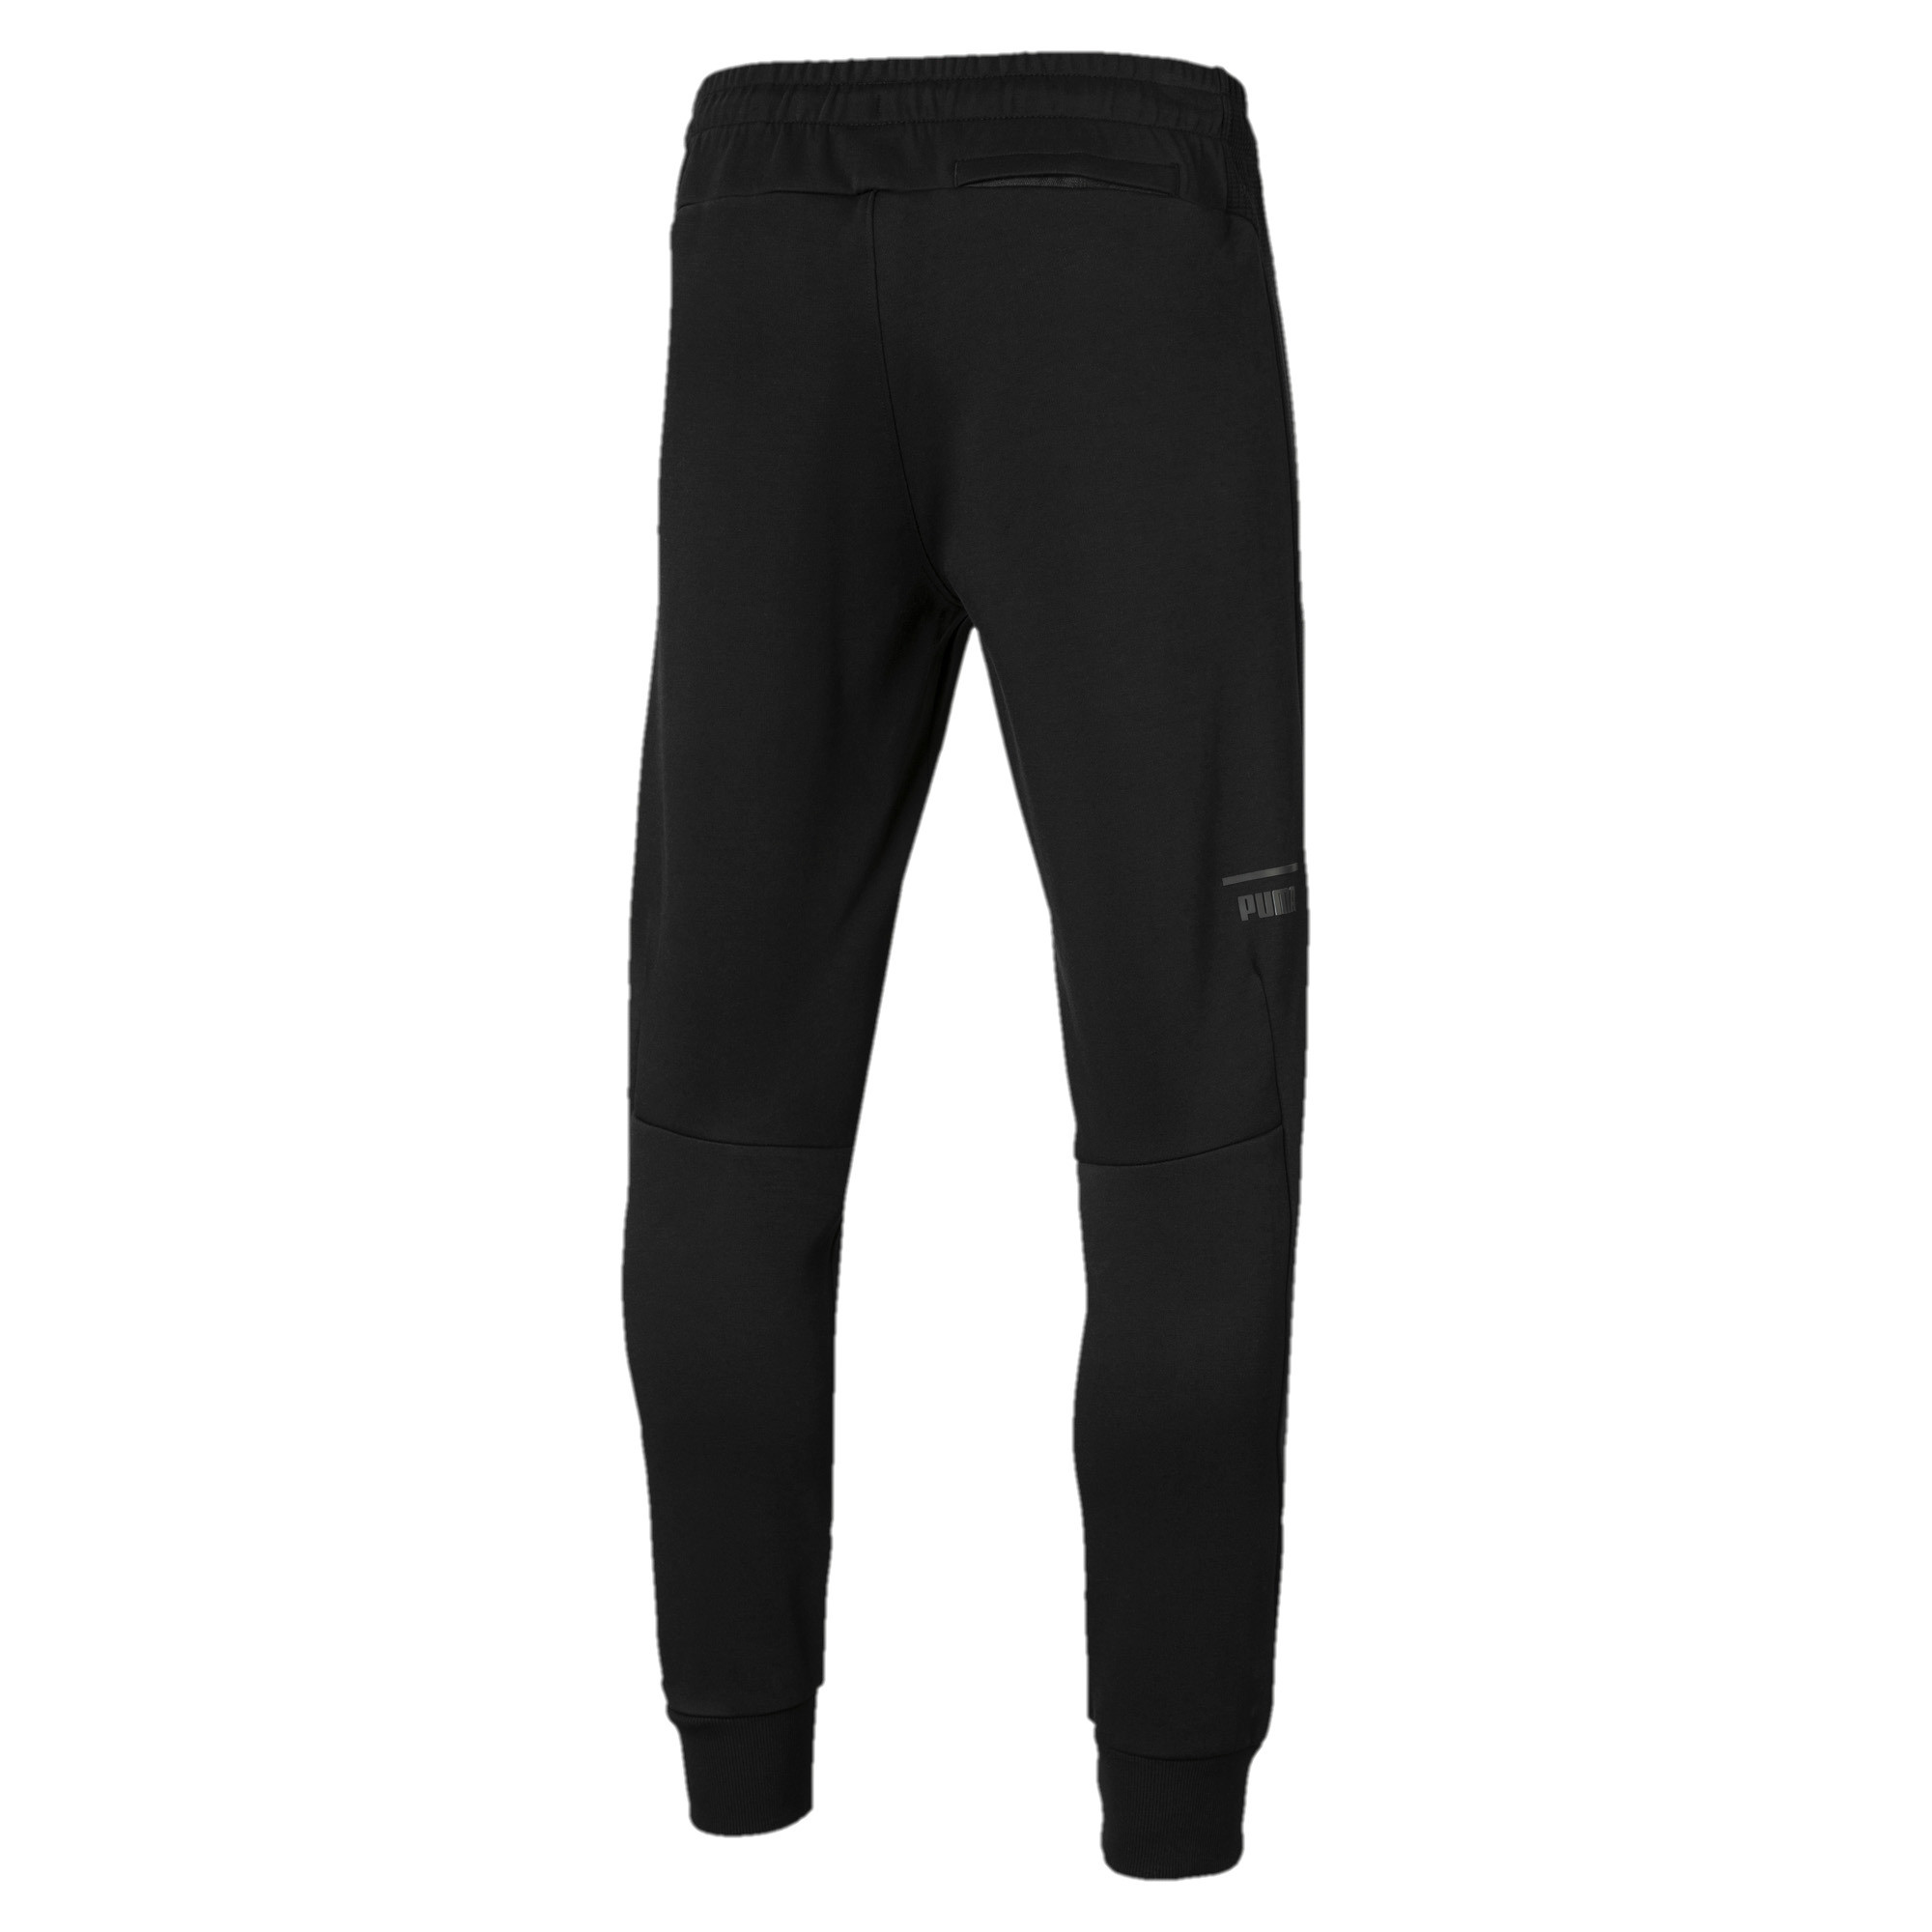 Pantalones deportivos para hombre Pace